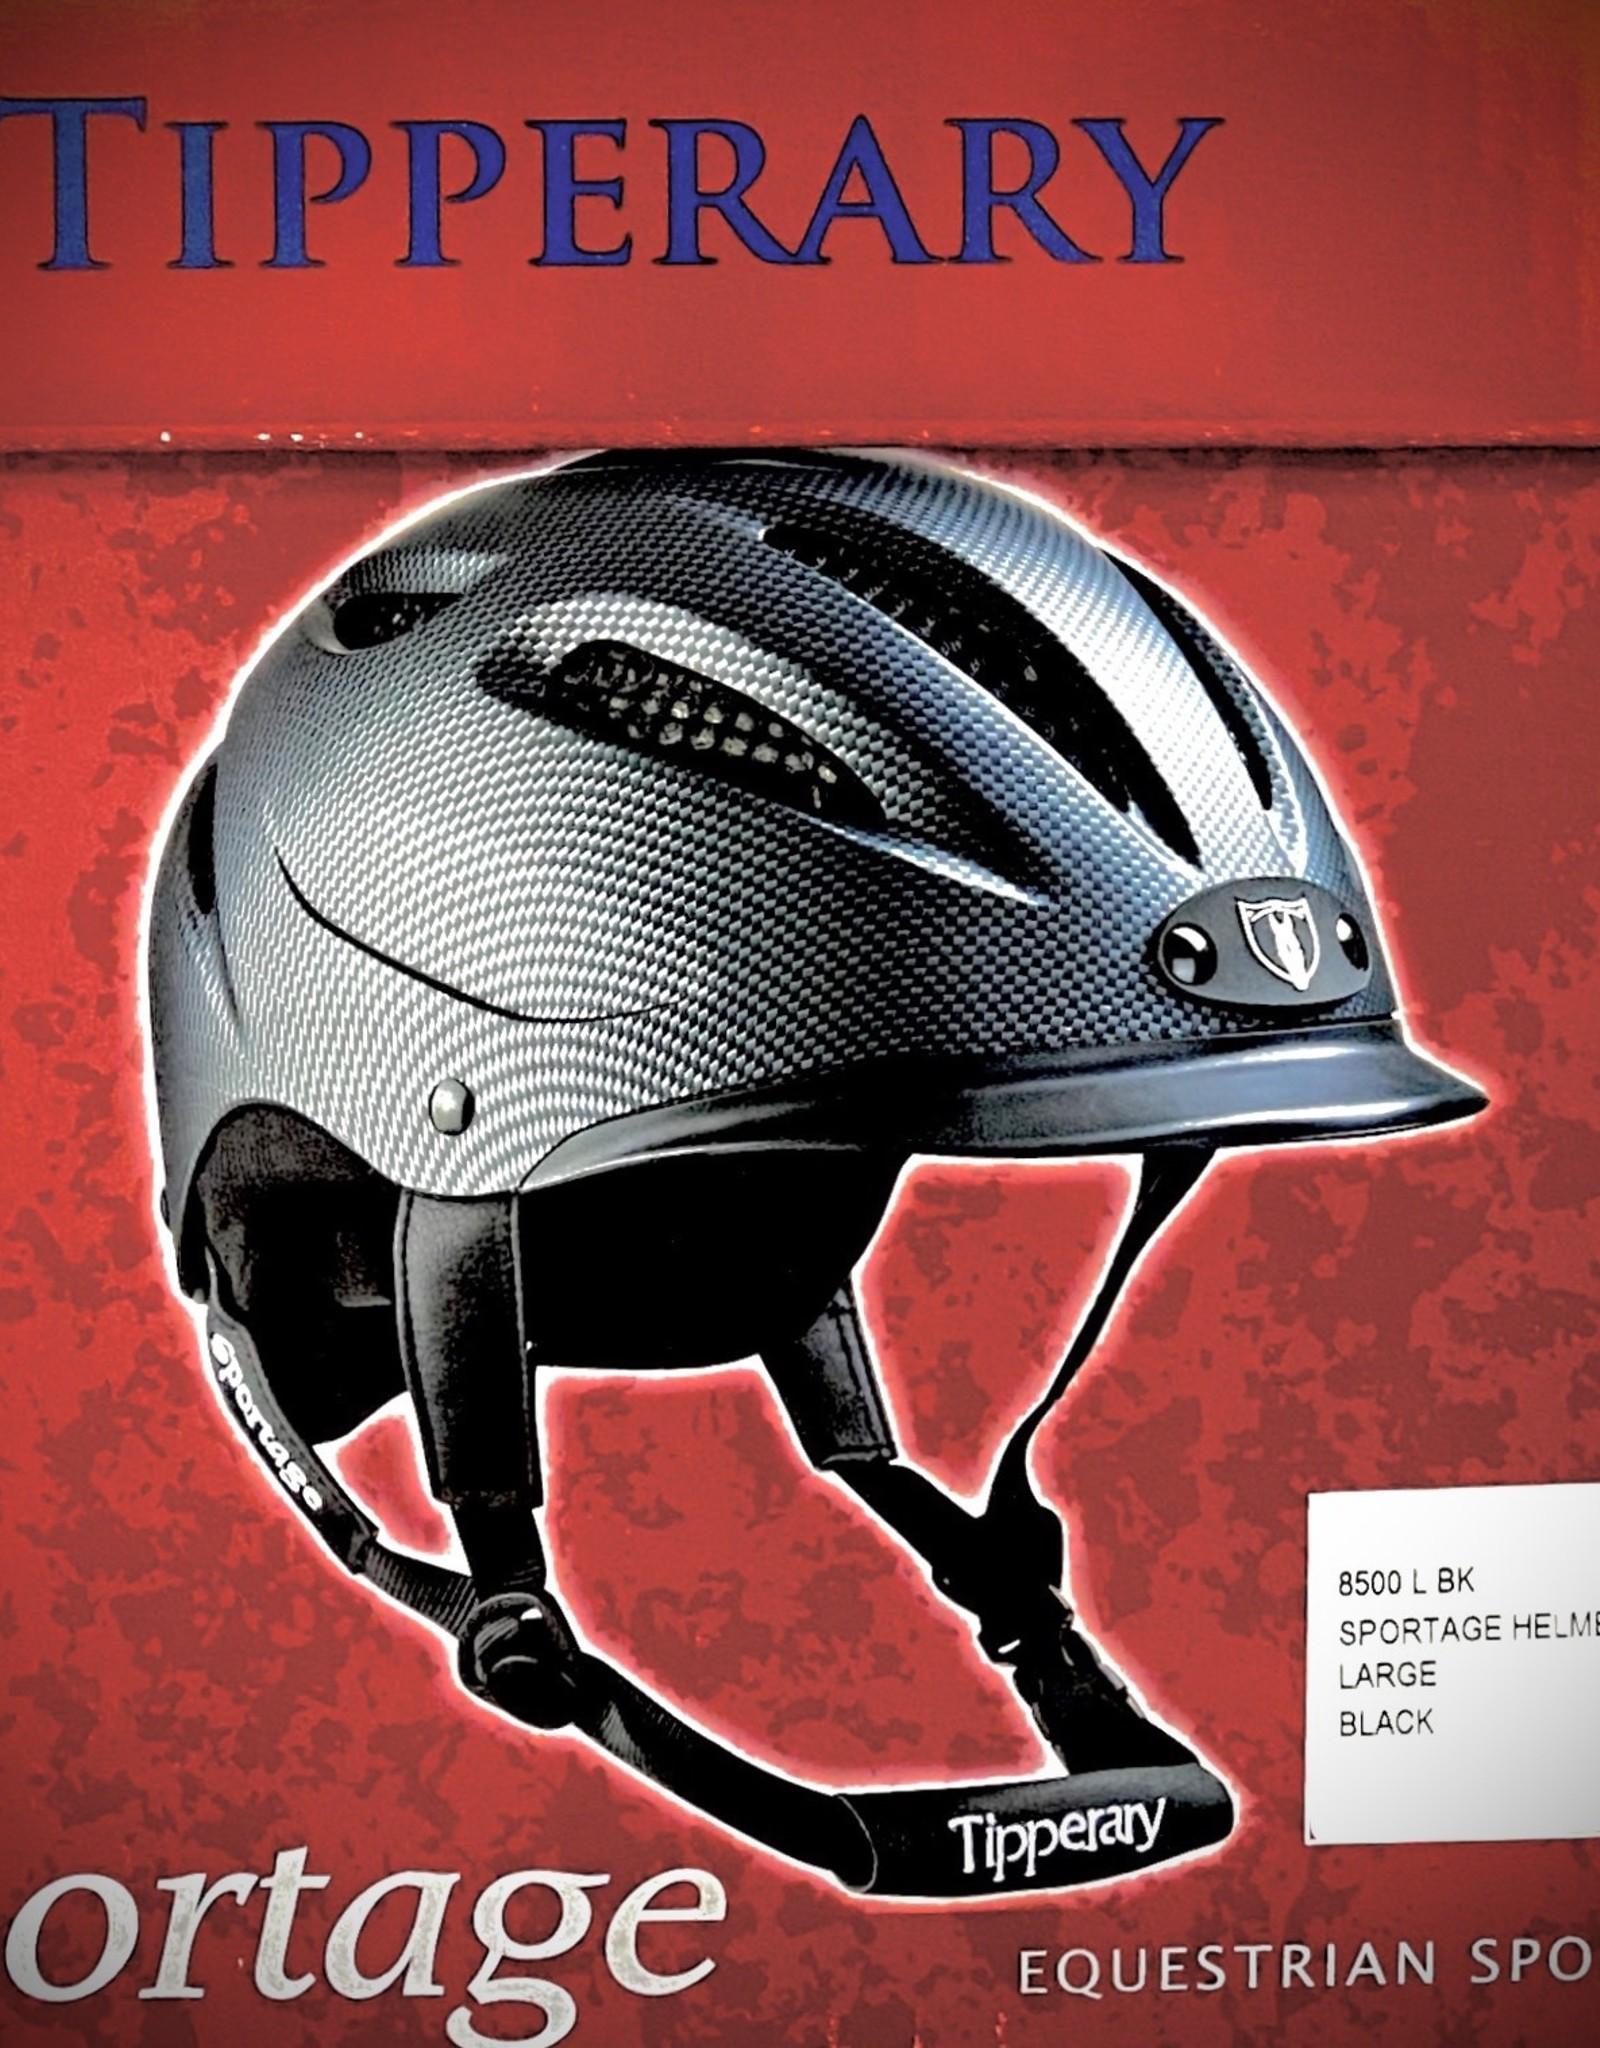 HELMET TIPPERARY SPORTAGE BLACK 8500